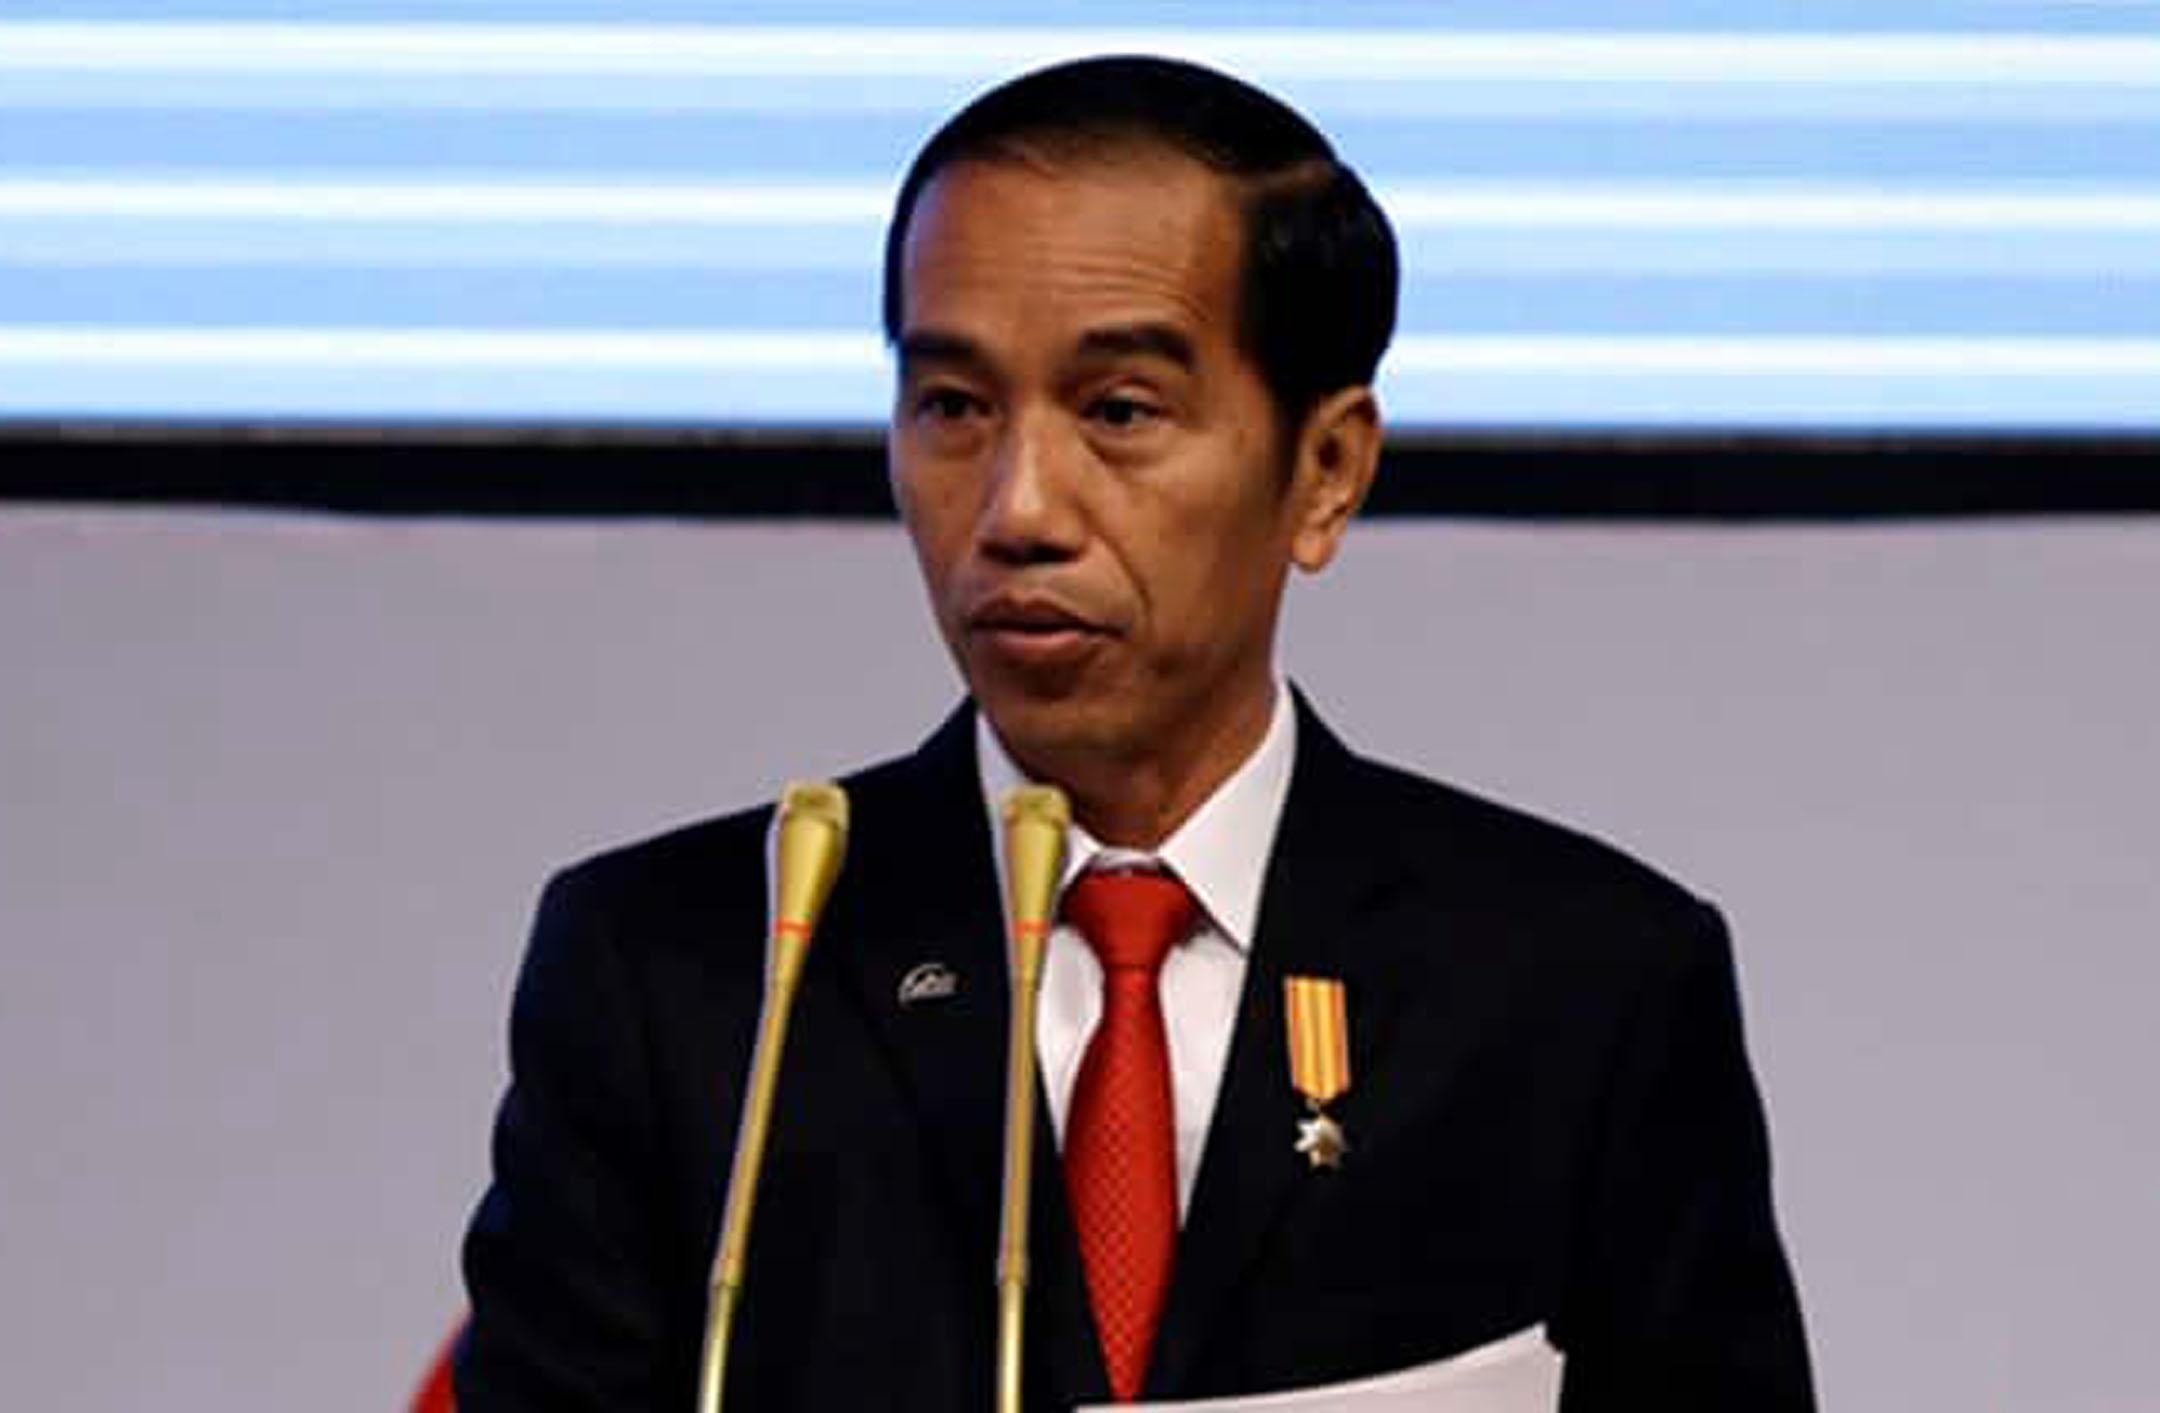 Indonesia's President Widodo Wins Second Term